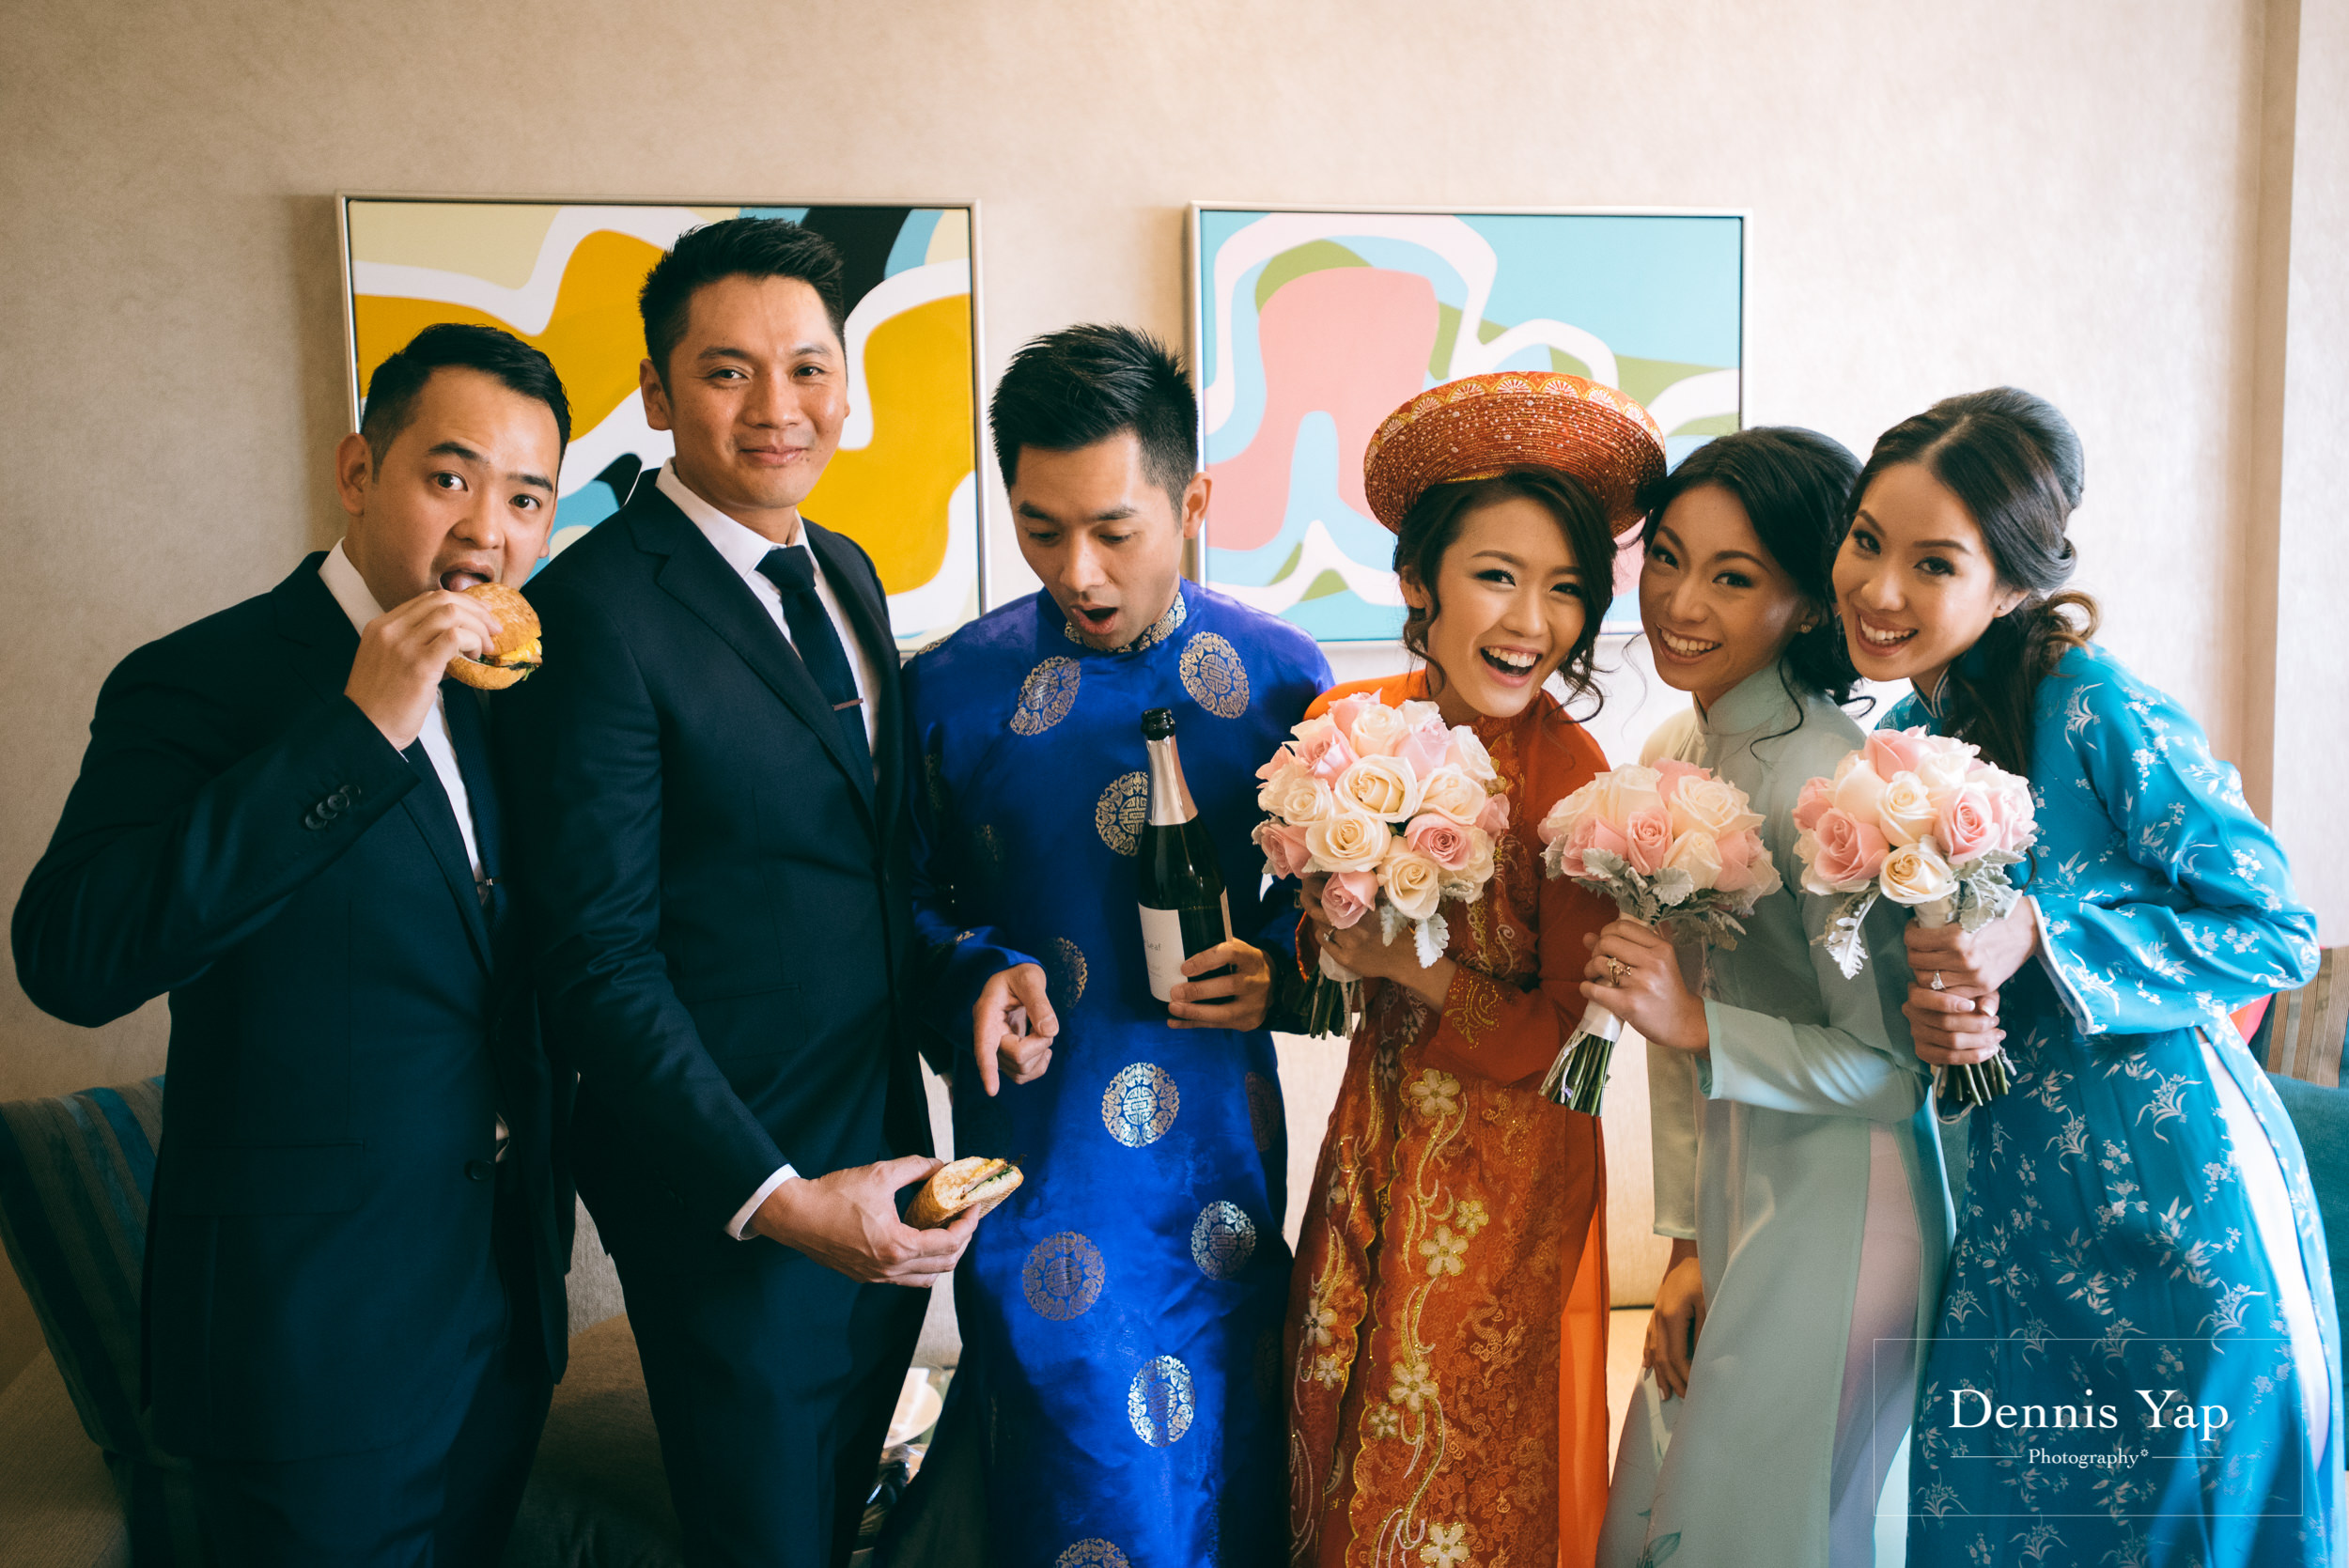 thang veng vietnamese wedding brisbane dennis yap photography malaysia wedding photographer-6.jpg